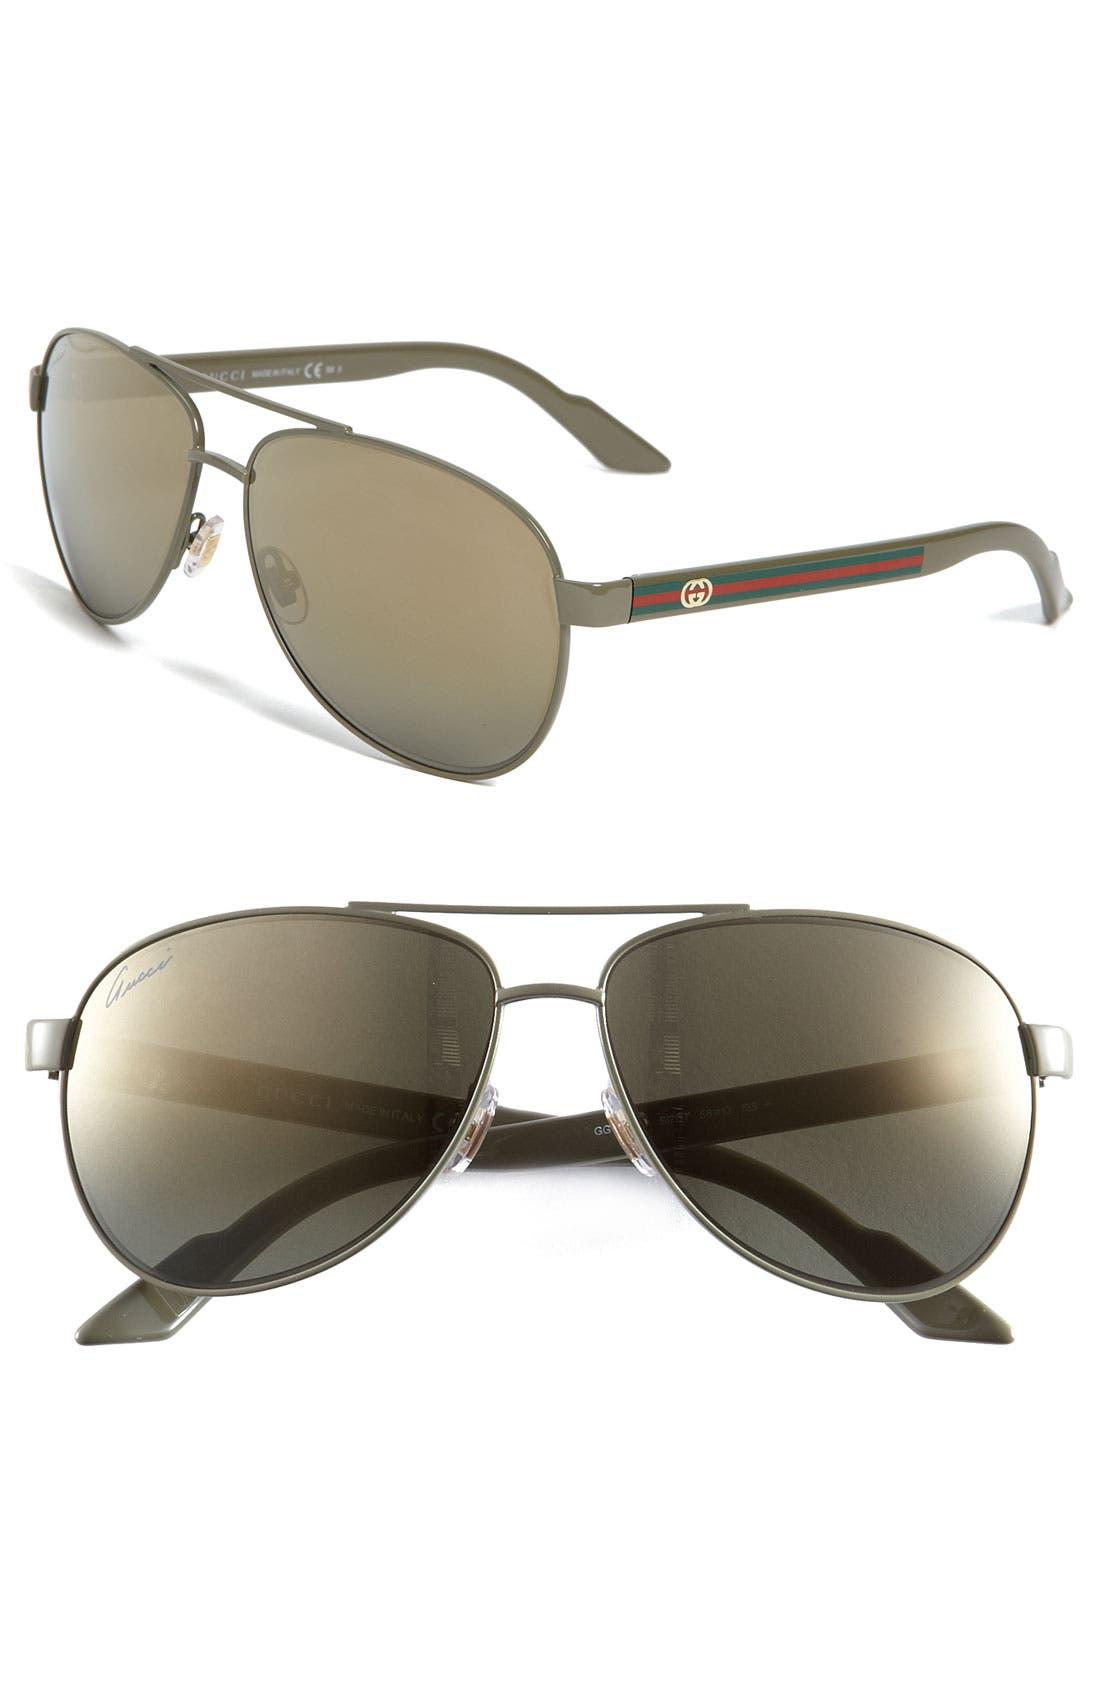 Main Image - Gucci 'Ribbon' 58mm Aviator Sunglasses